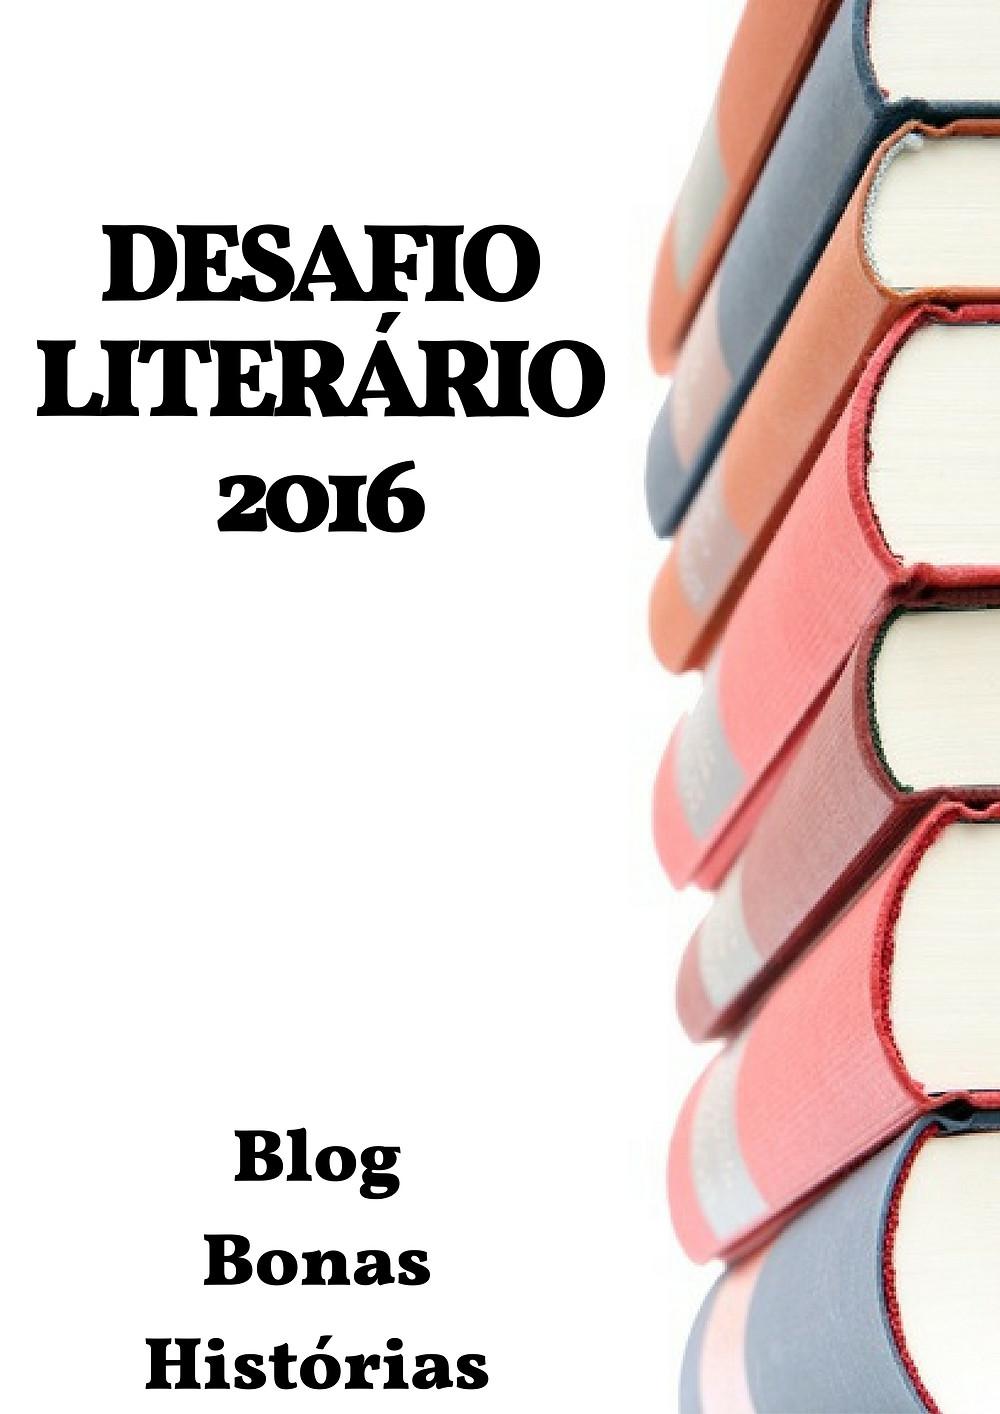 Desafio Literário de 2016